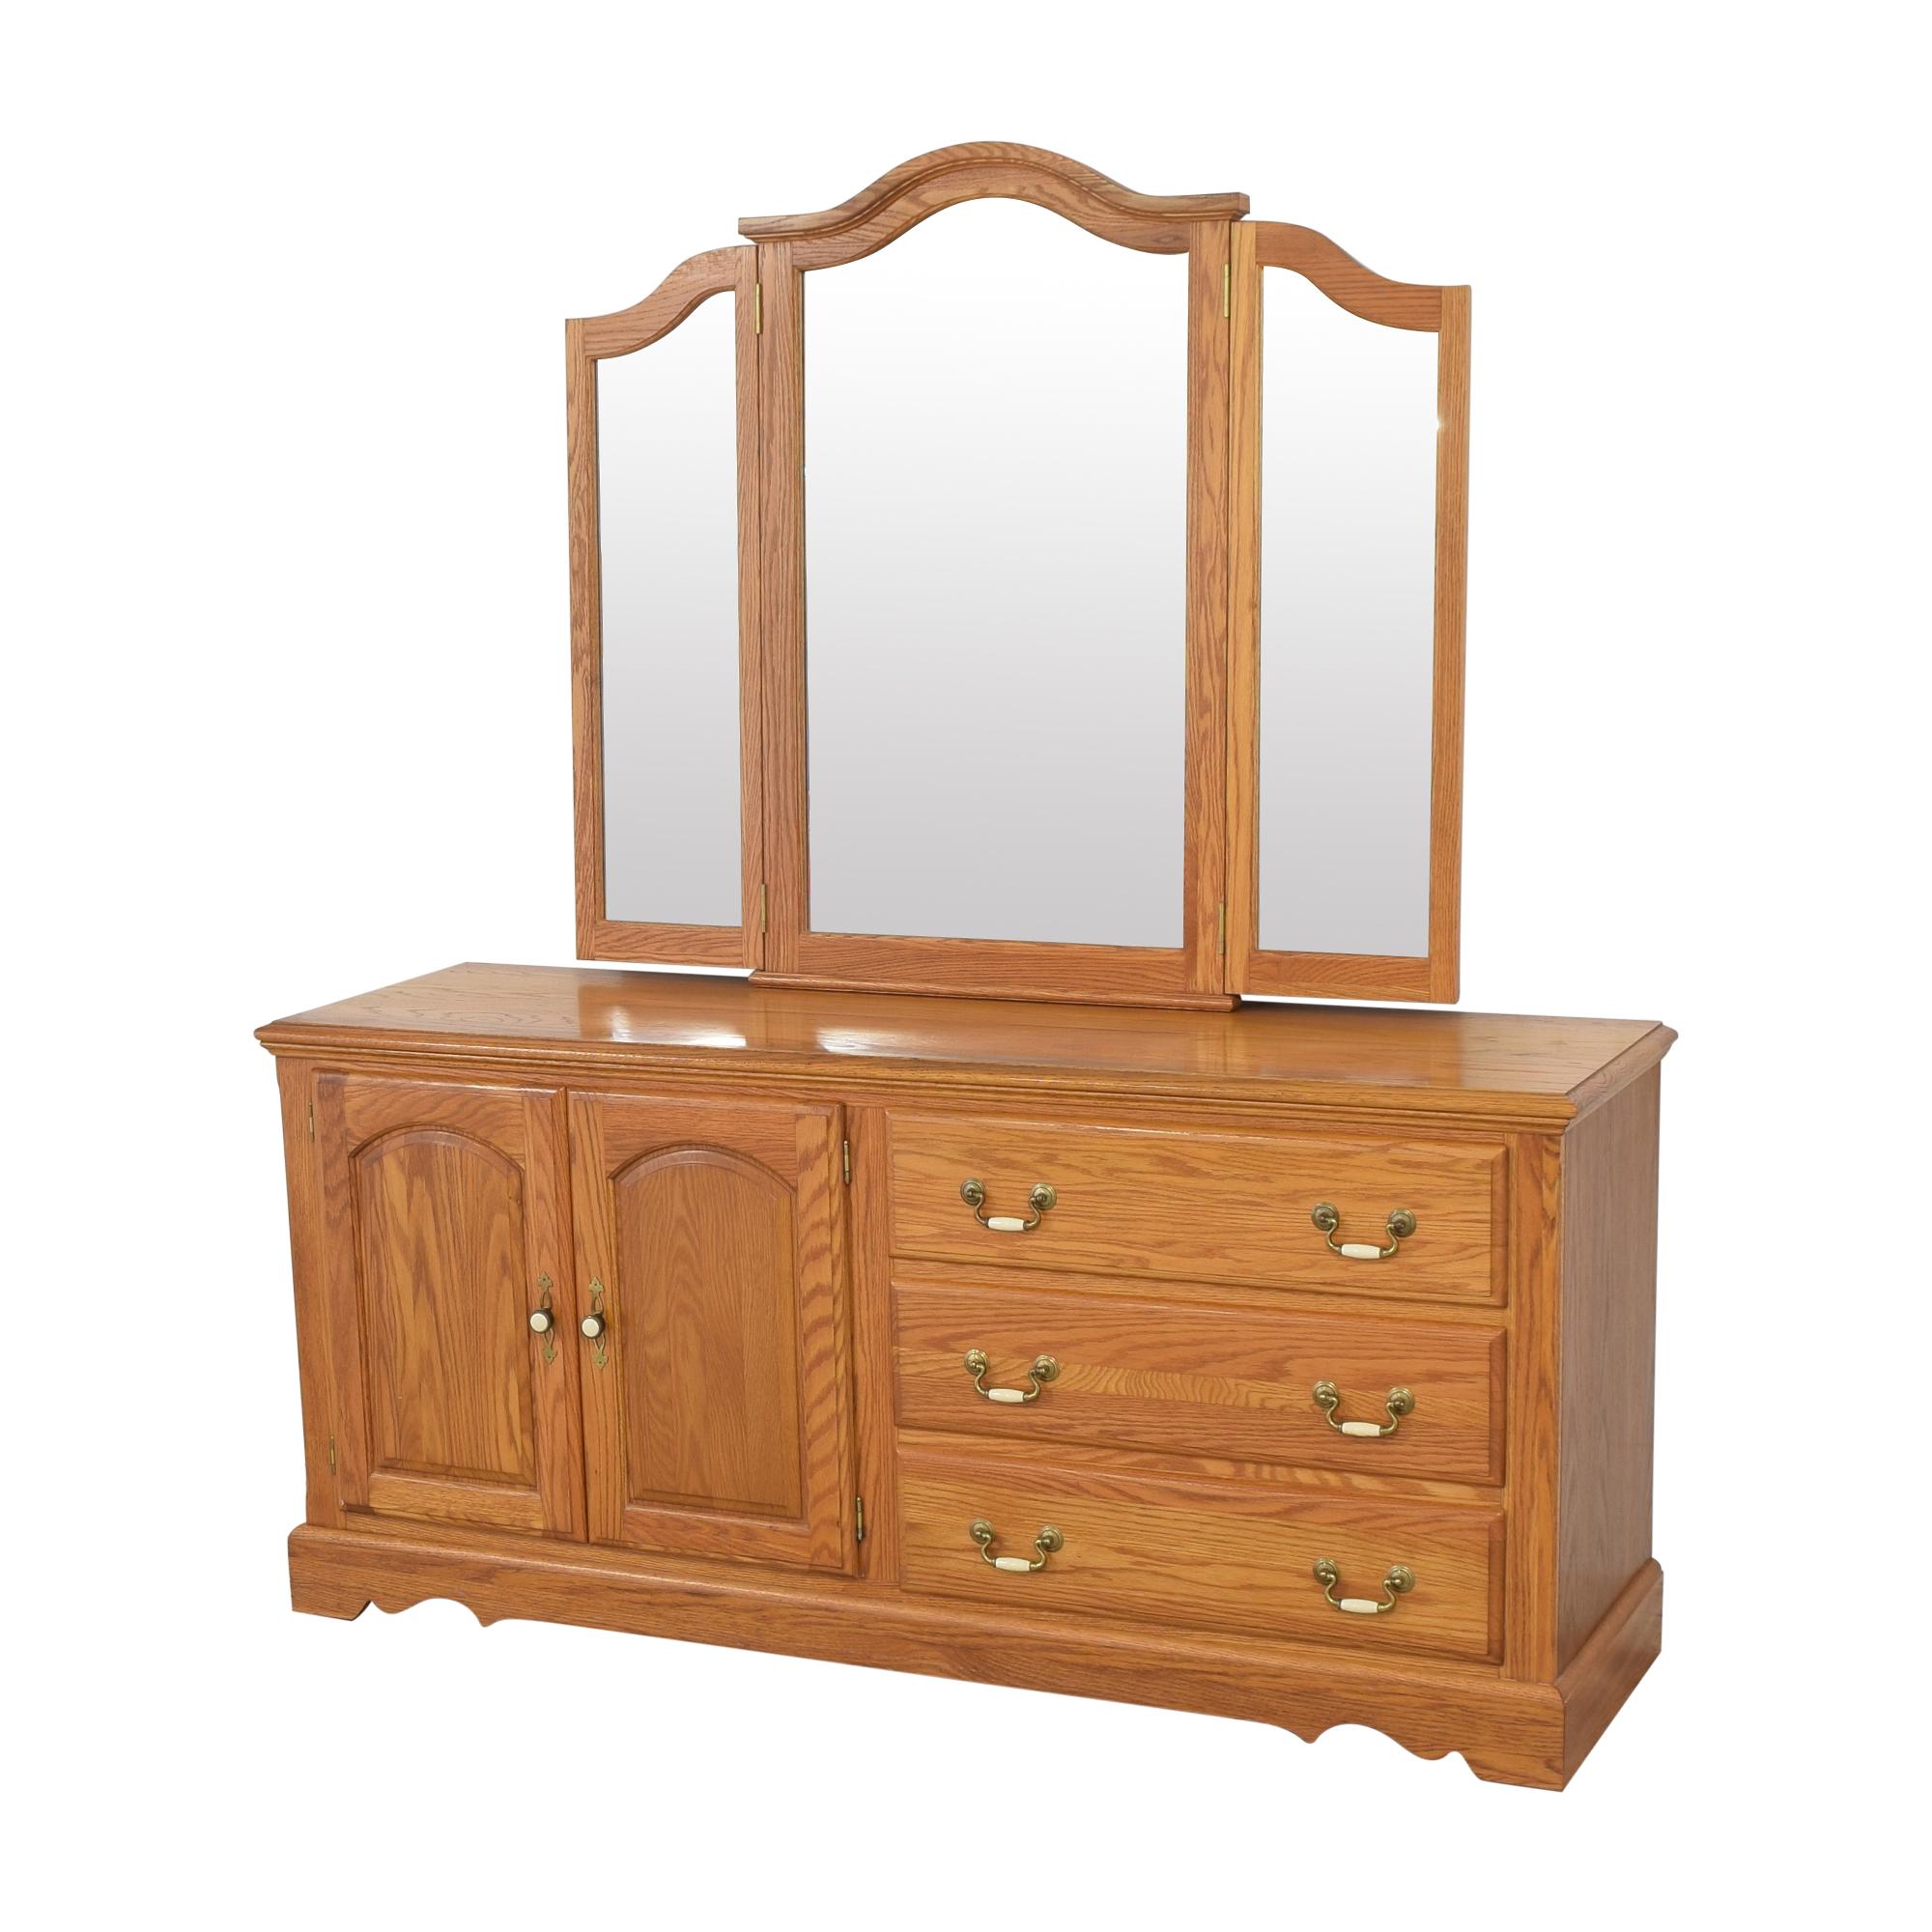 Nathan Hale Nathan Hale Door Dresser and Triple Mirror on sale